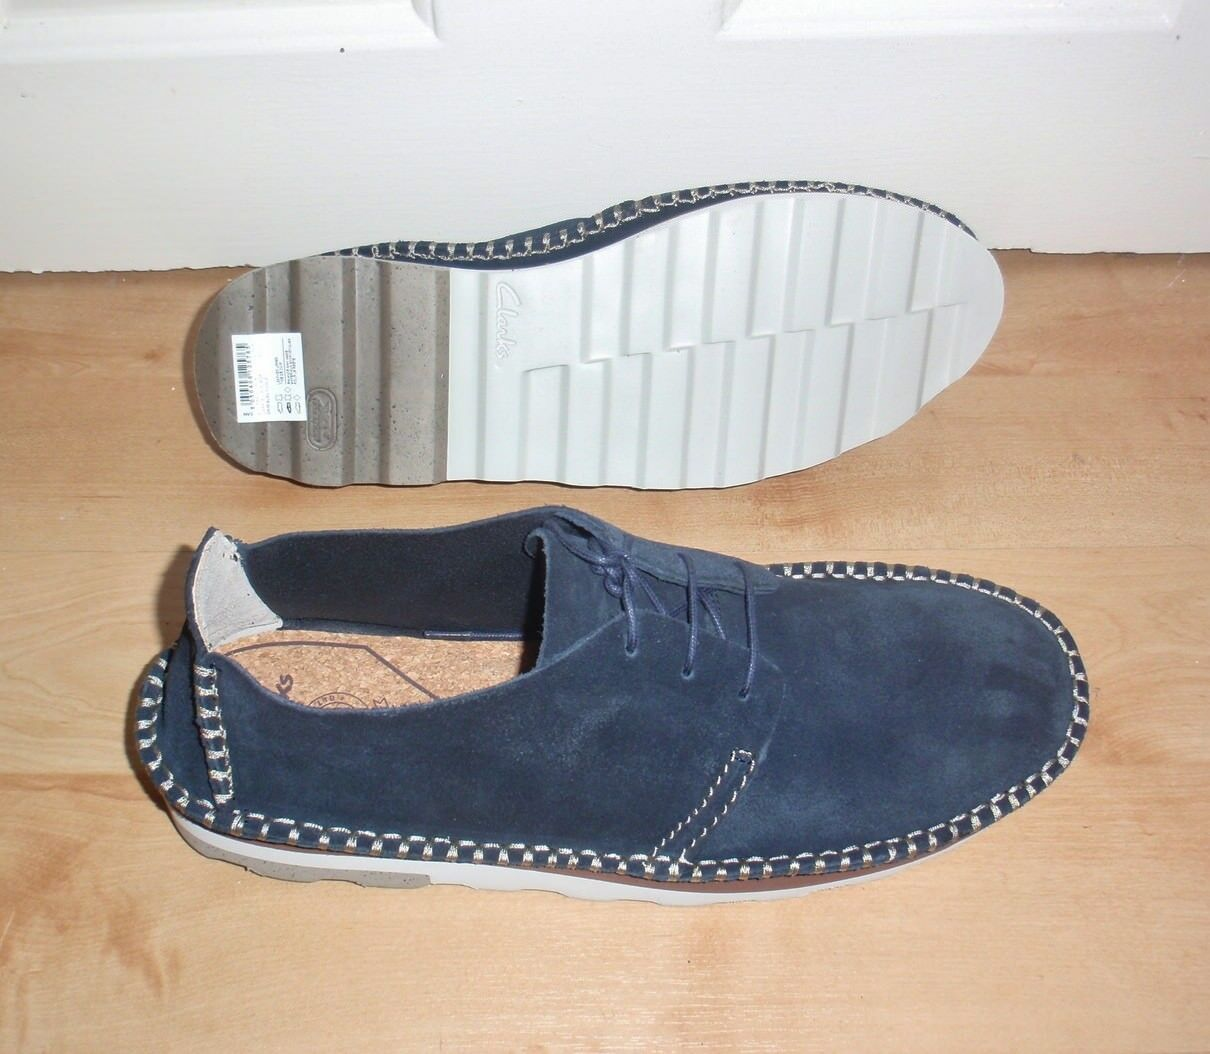 BNIB Clarks mens DAKIN WALK blue suede laced casual shoes